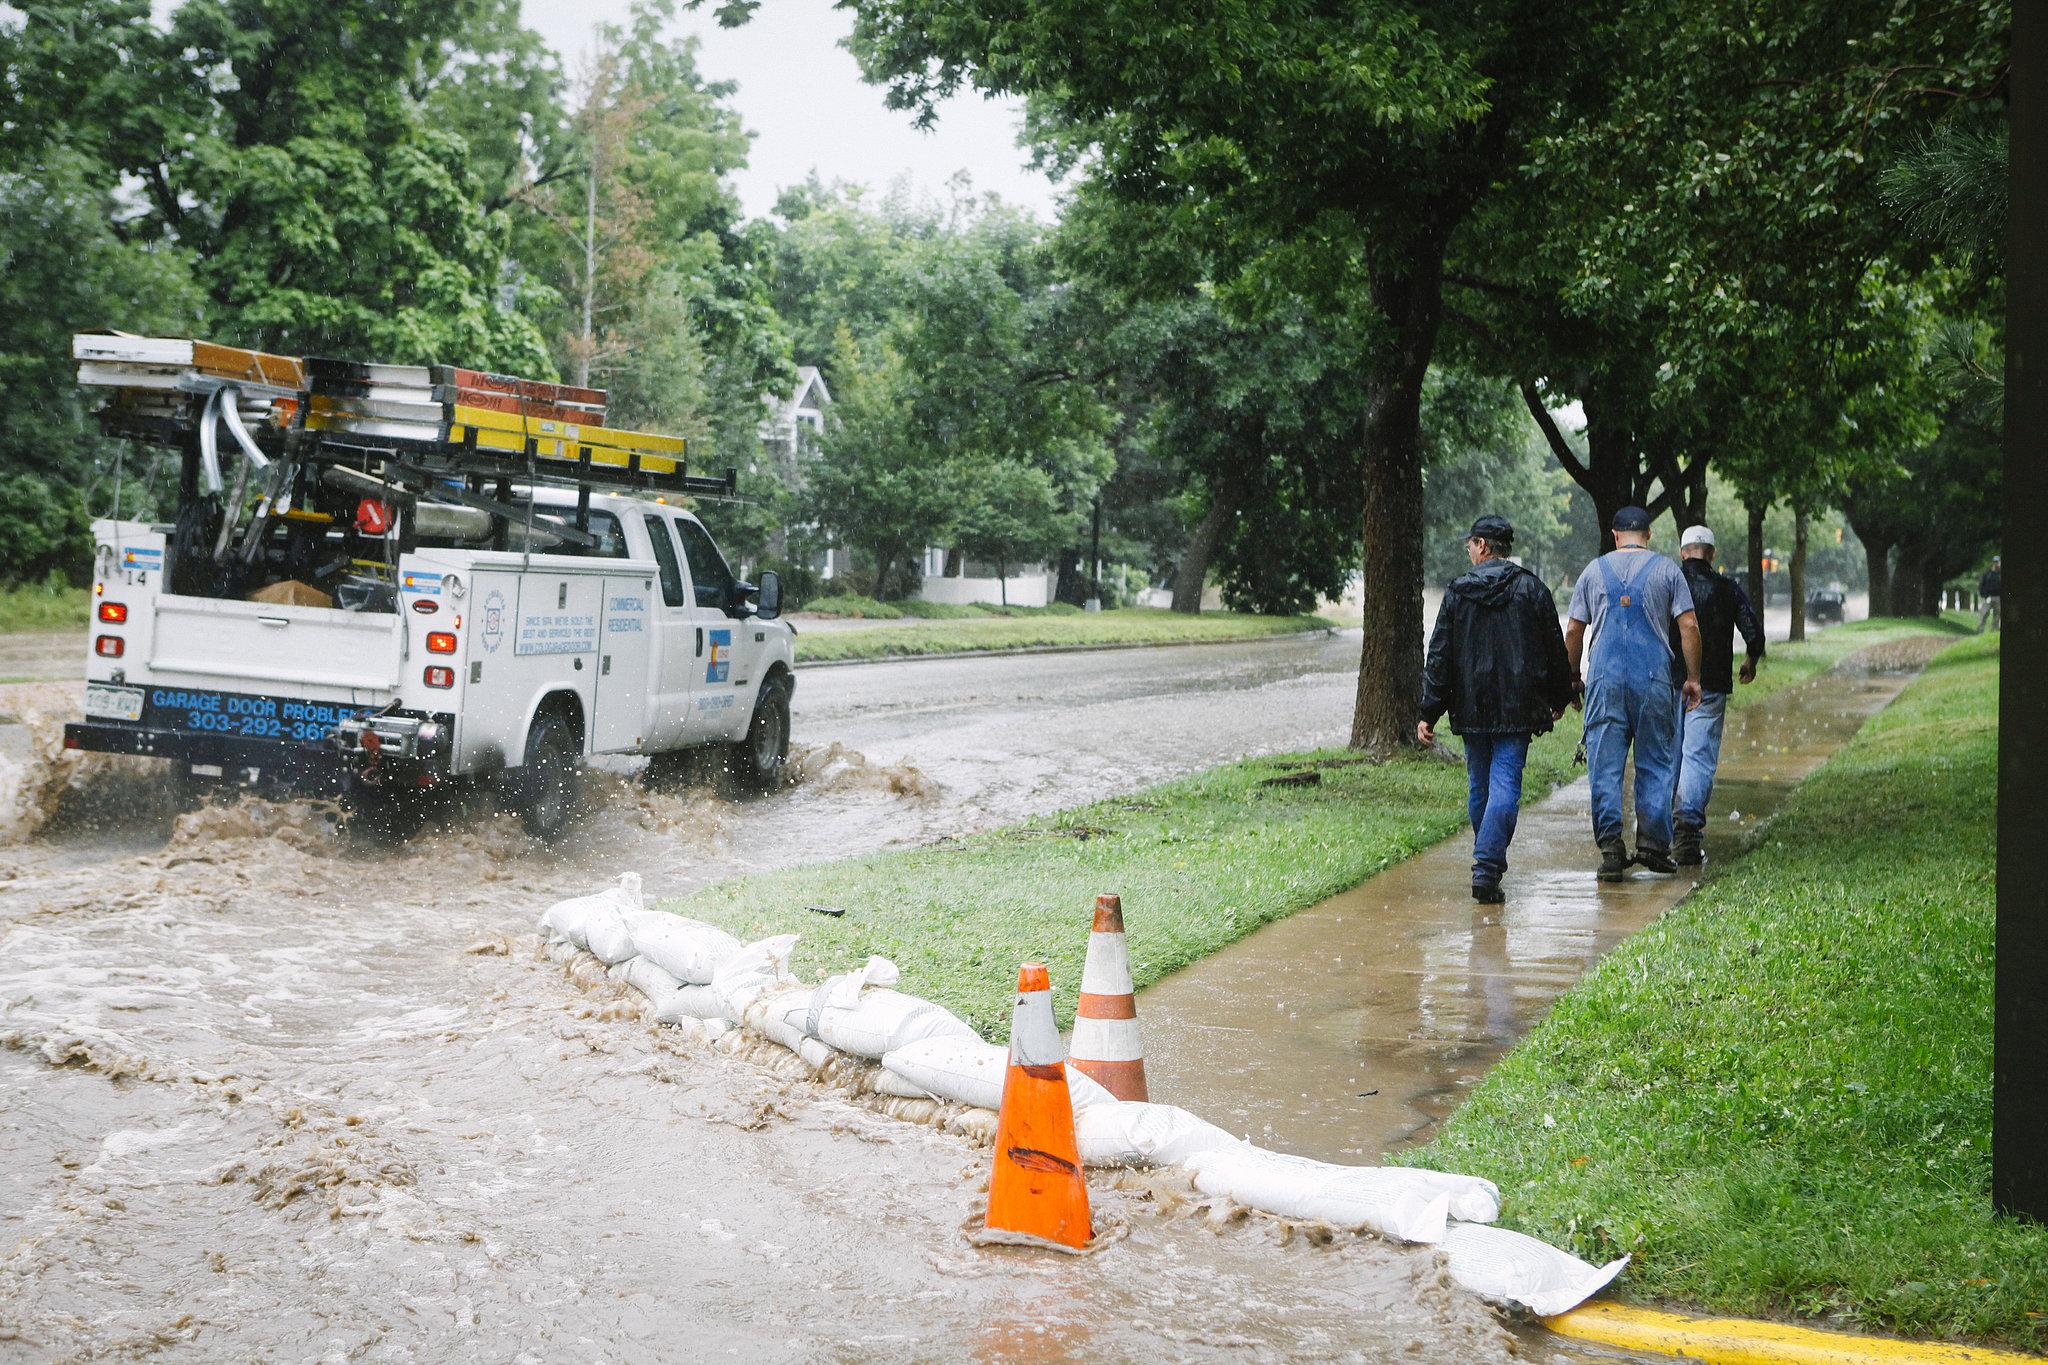 Sandbags were left along Canyon Boulevard to ease the flood in Boulder.